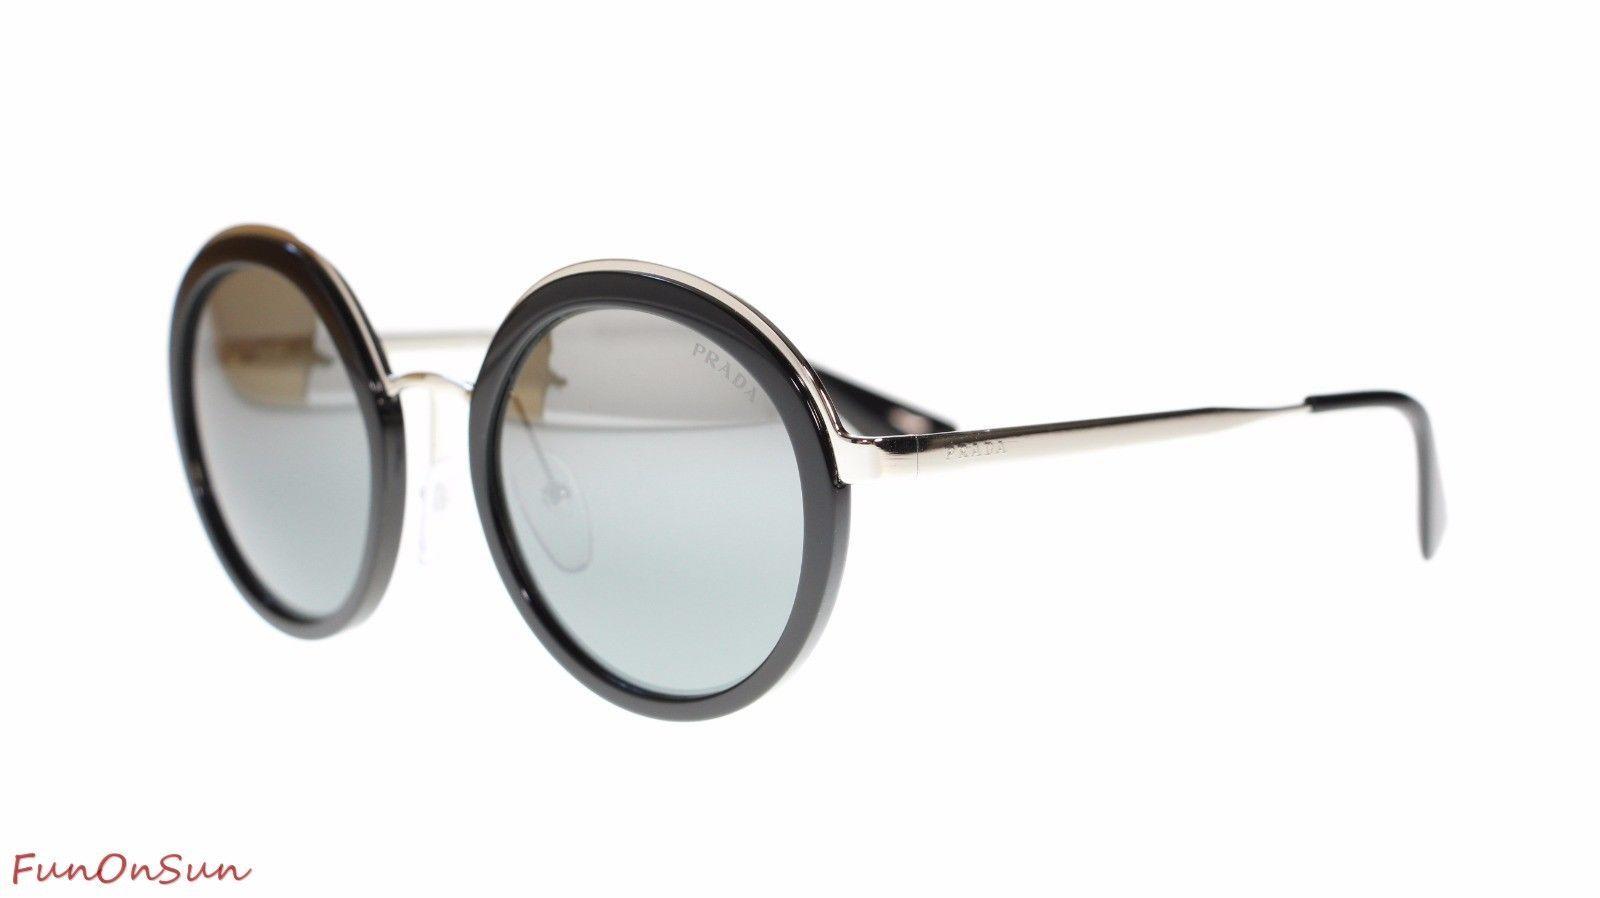 e0d262eeb8a2 S l1600. S l1600. Previous. Prada Round Womens Sunglasses PR50TS 1AB6N2  Black Grey Mirror Silver Gradient